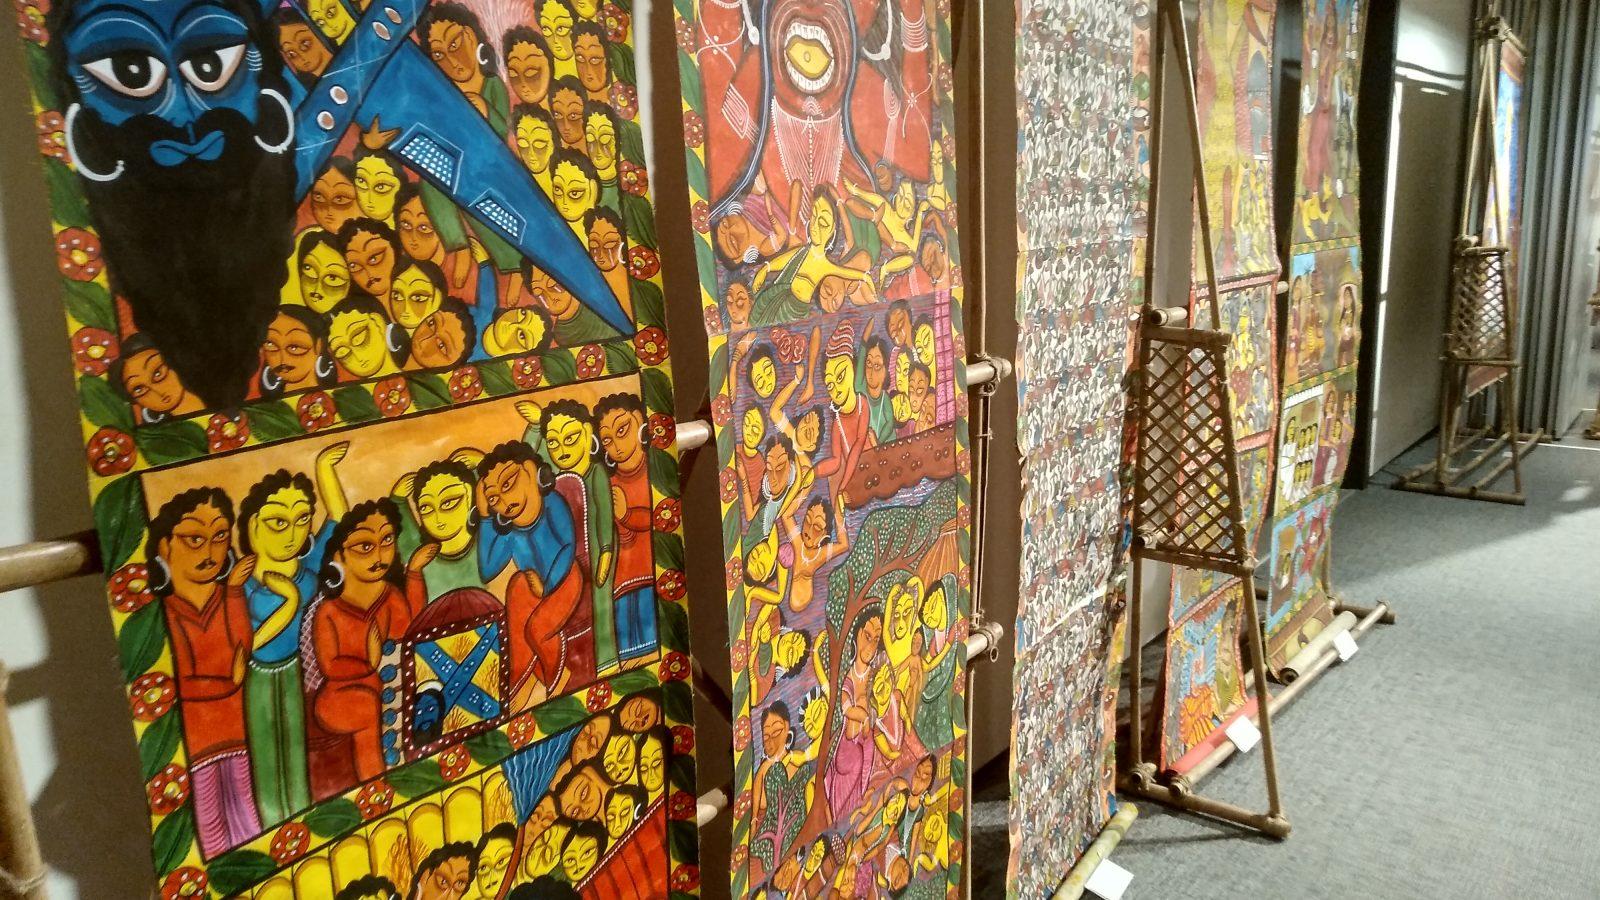 2 Bengal's Pat of Gold. Courtesy of Kolkata Centre for Creativity